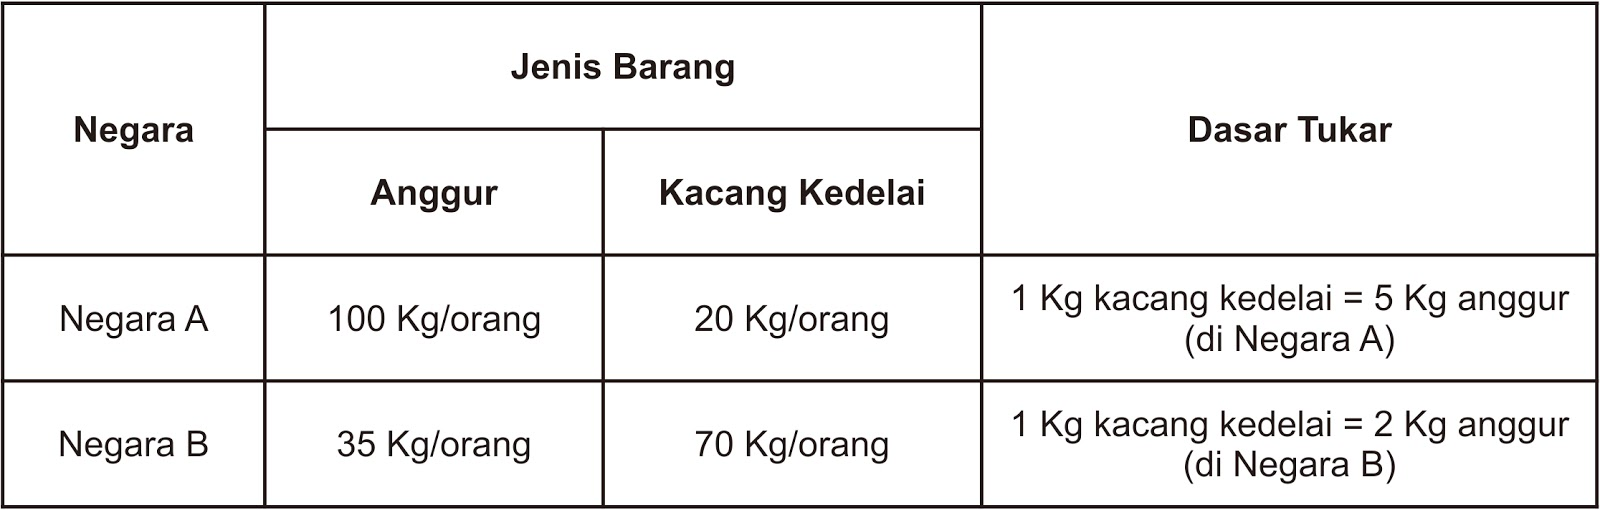 teori sistem perdagangan indonesia